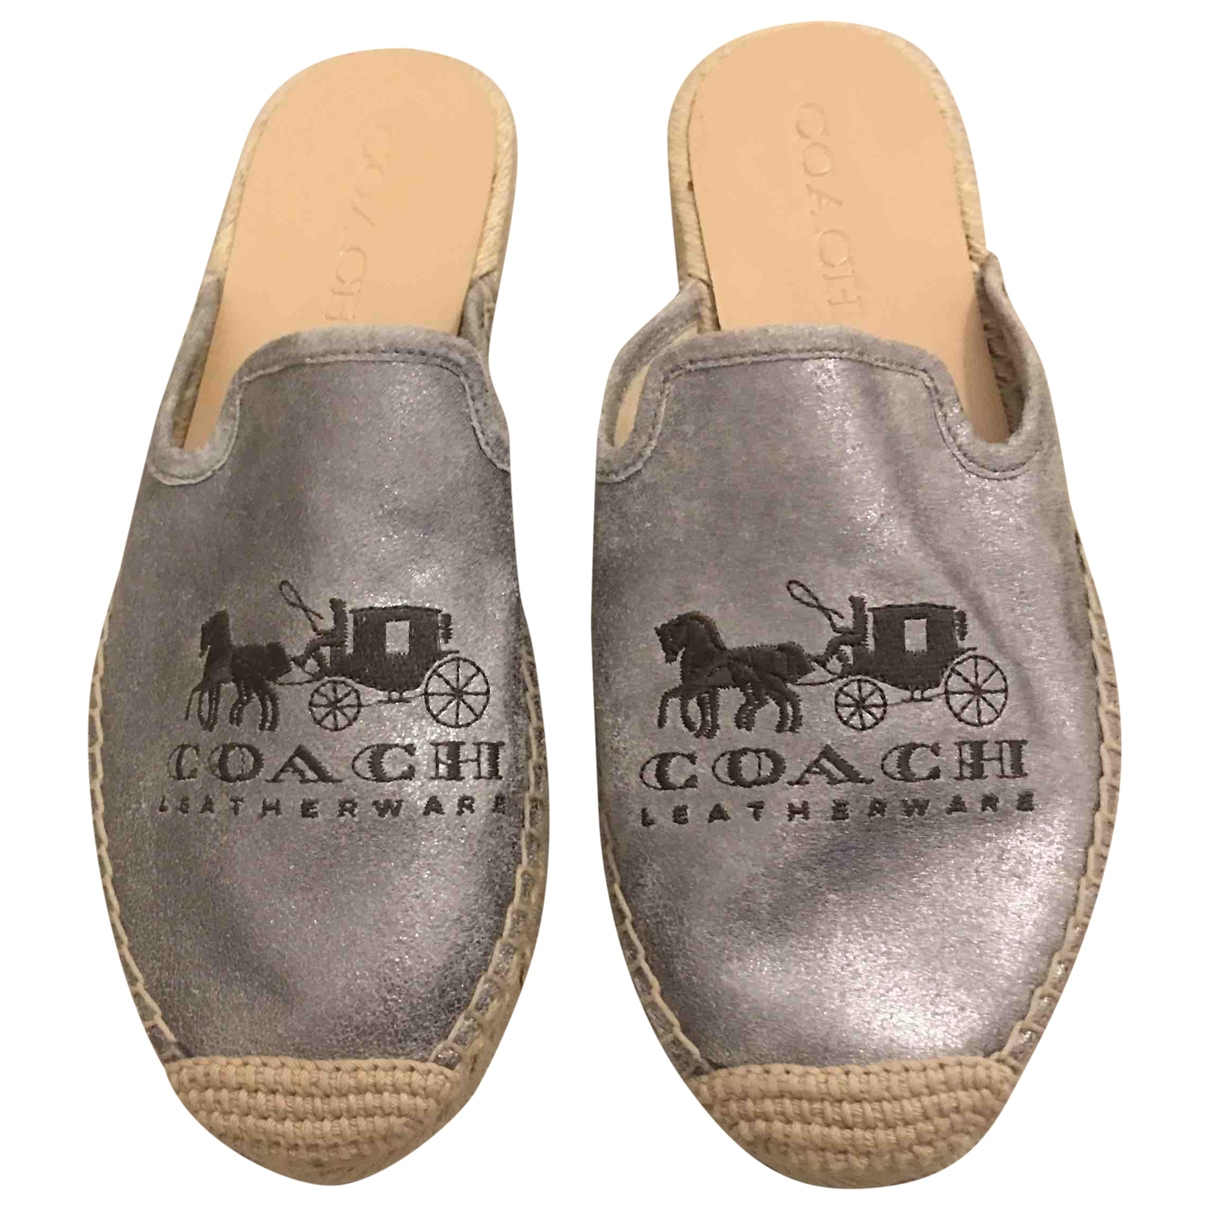 Coach \N Metallic Leather Espadrilles for Women 6 US